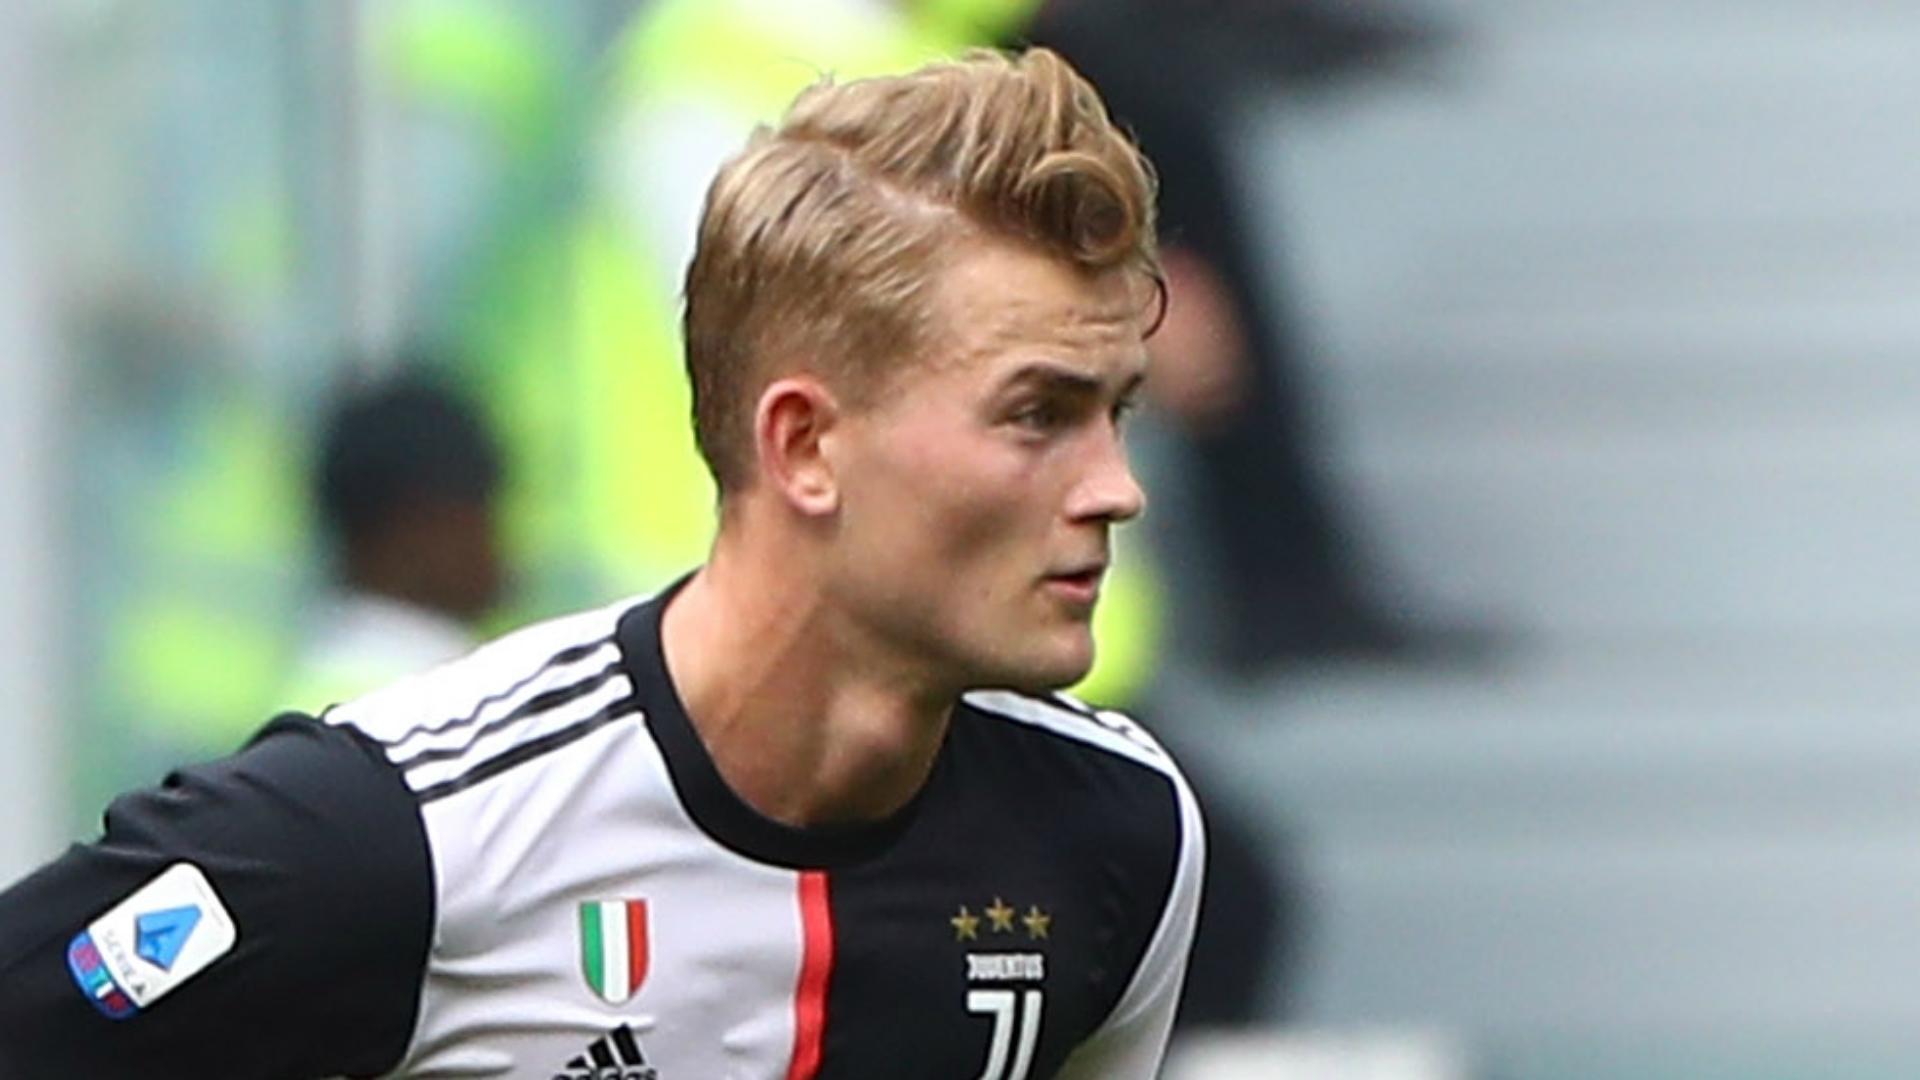 matthijs de ligt jnlnyuqm9uh1vuvhejugj4z8 - Juventus stay top, maintain winning routine against Torino